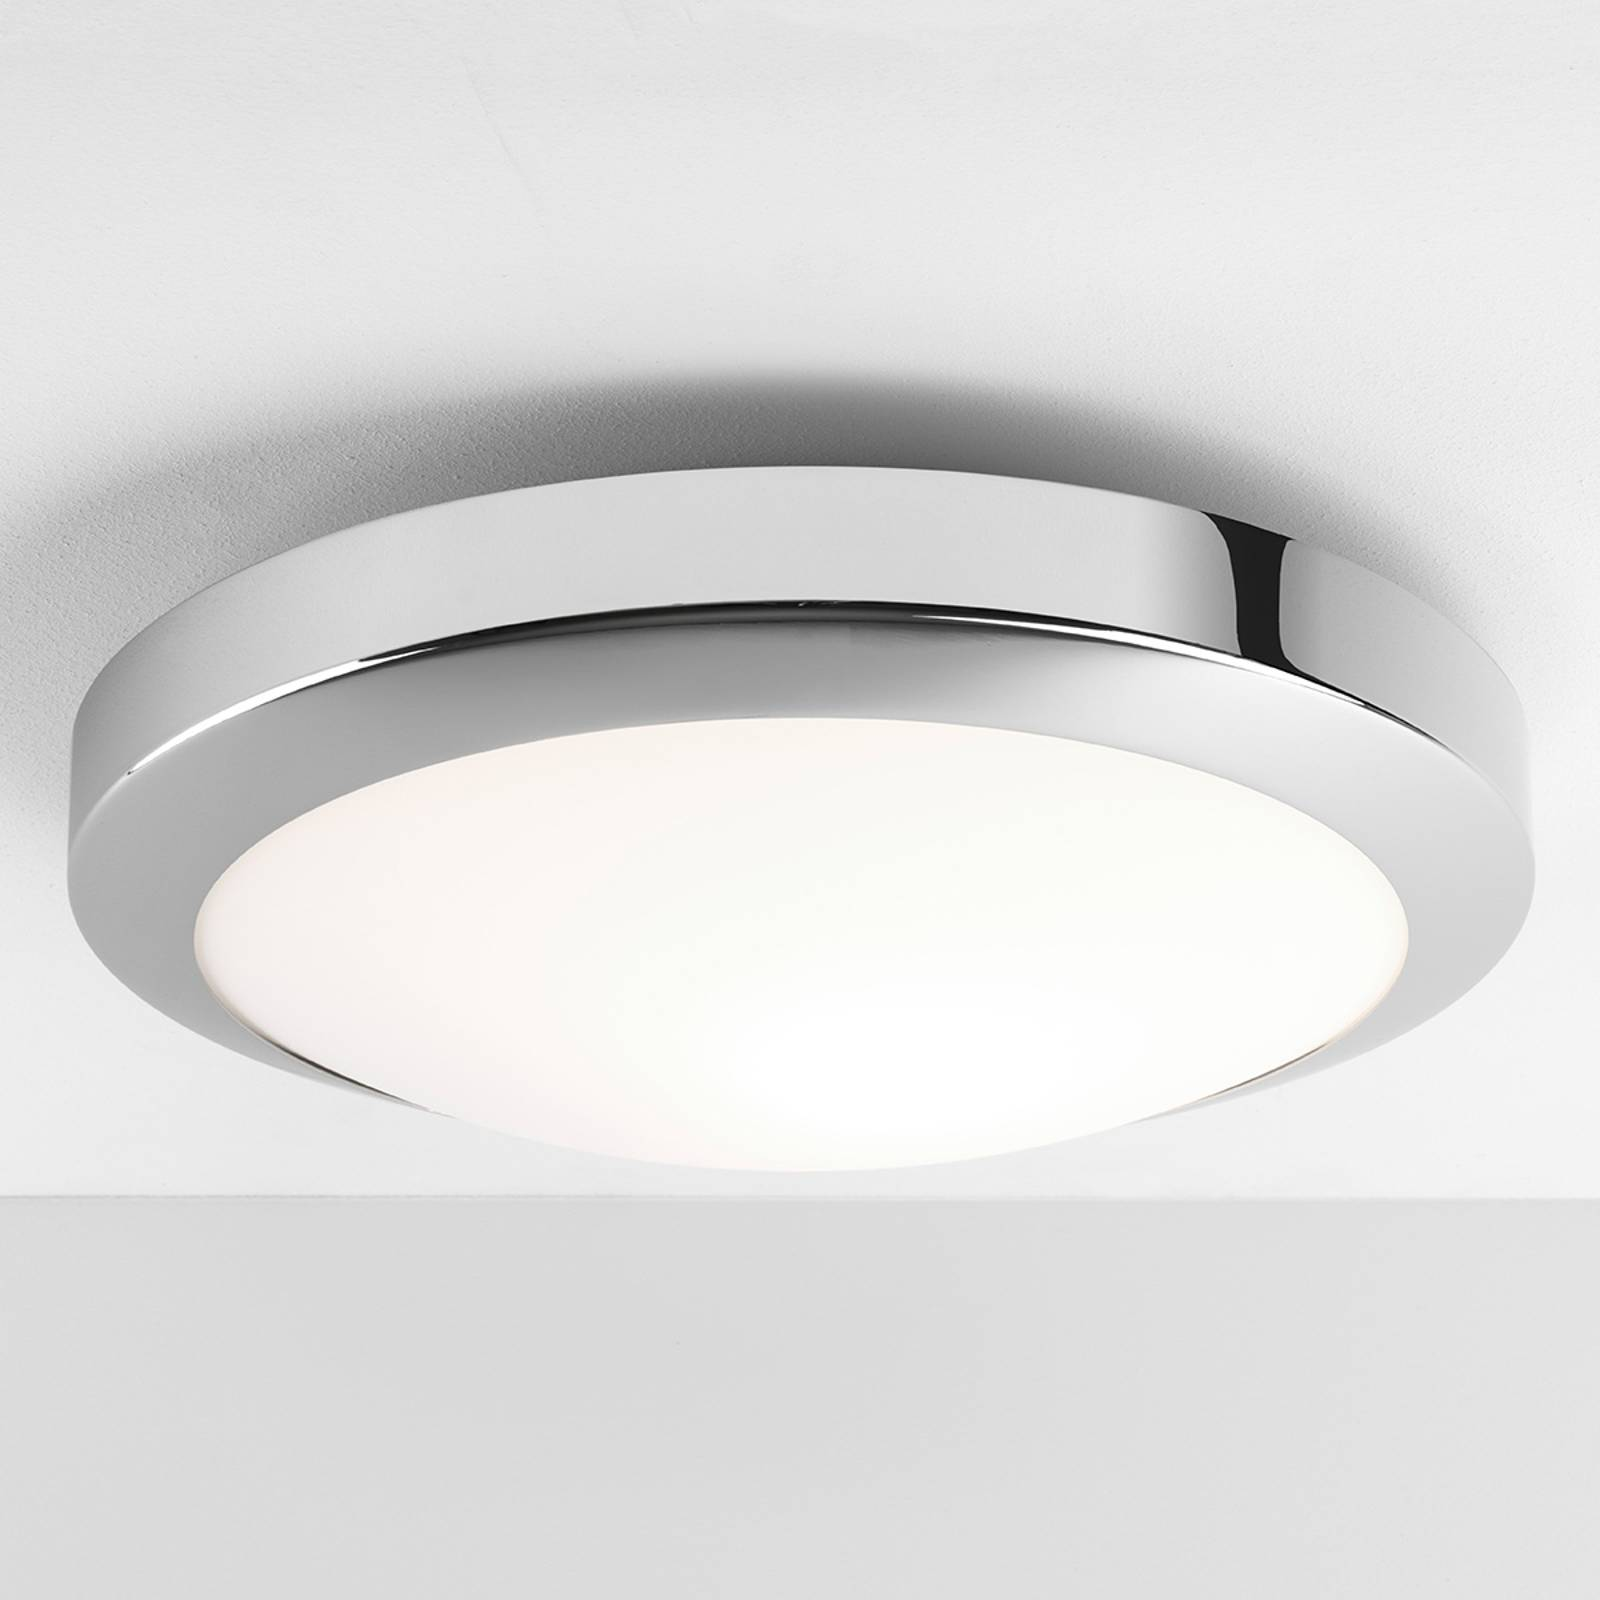 Klasyczna lampa sufitowa DAKOTA 300 chrom